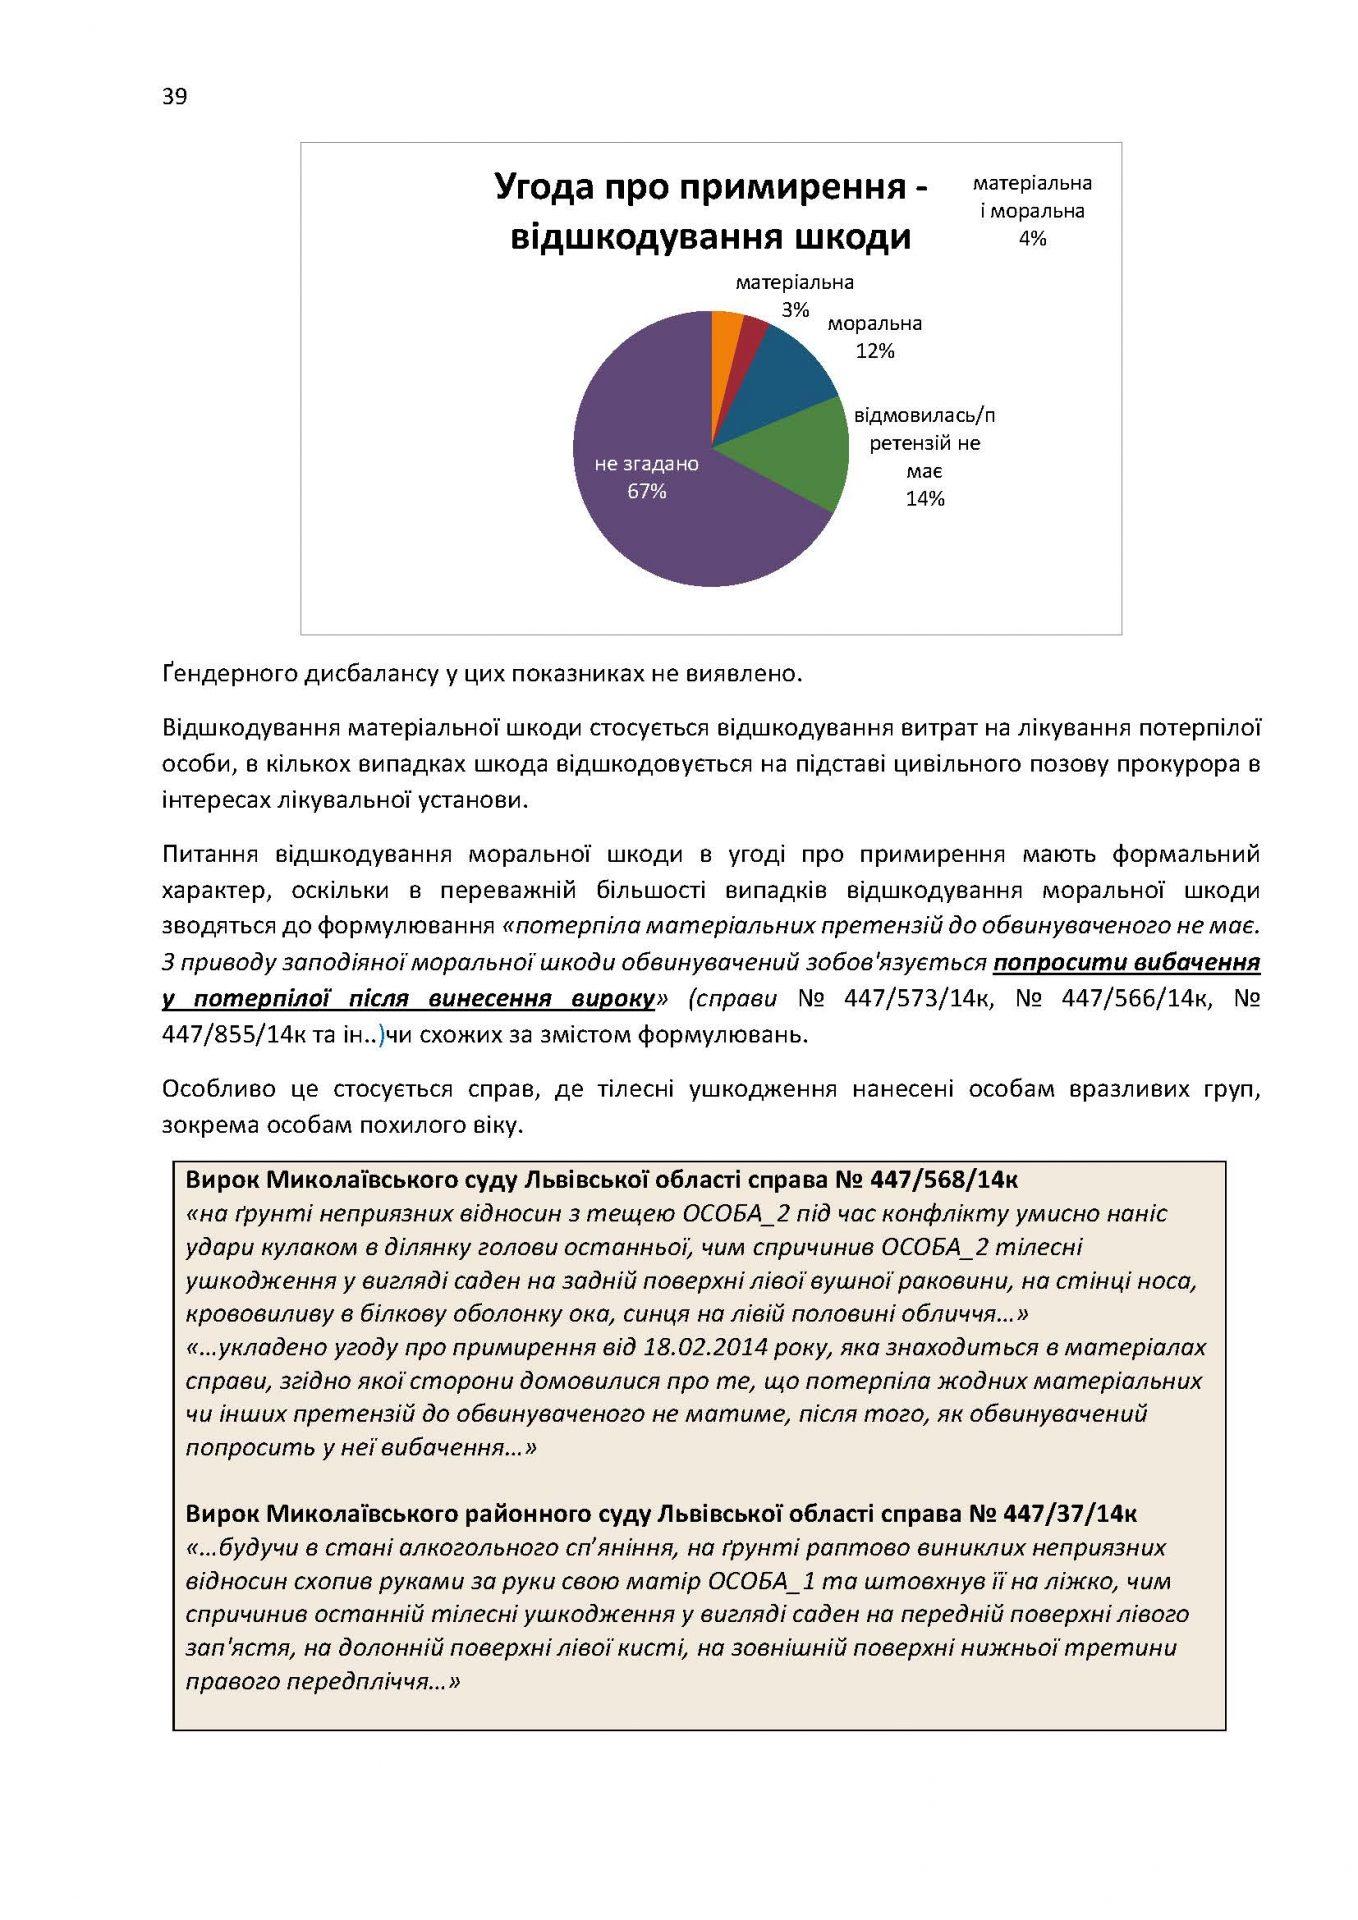 Draft Report monitoring print USAID_Страница_39